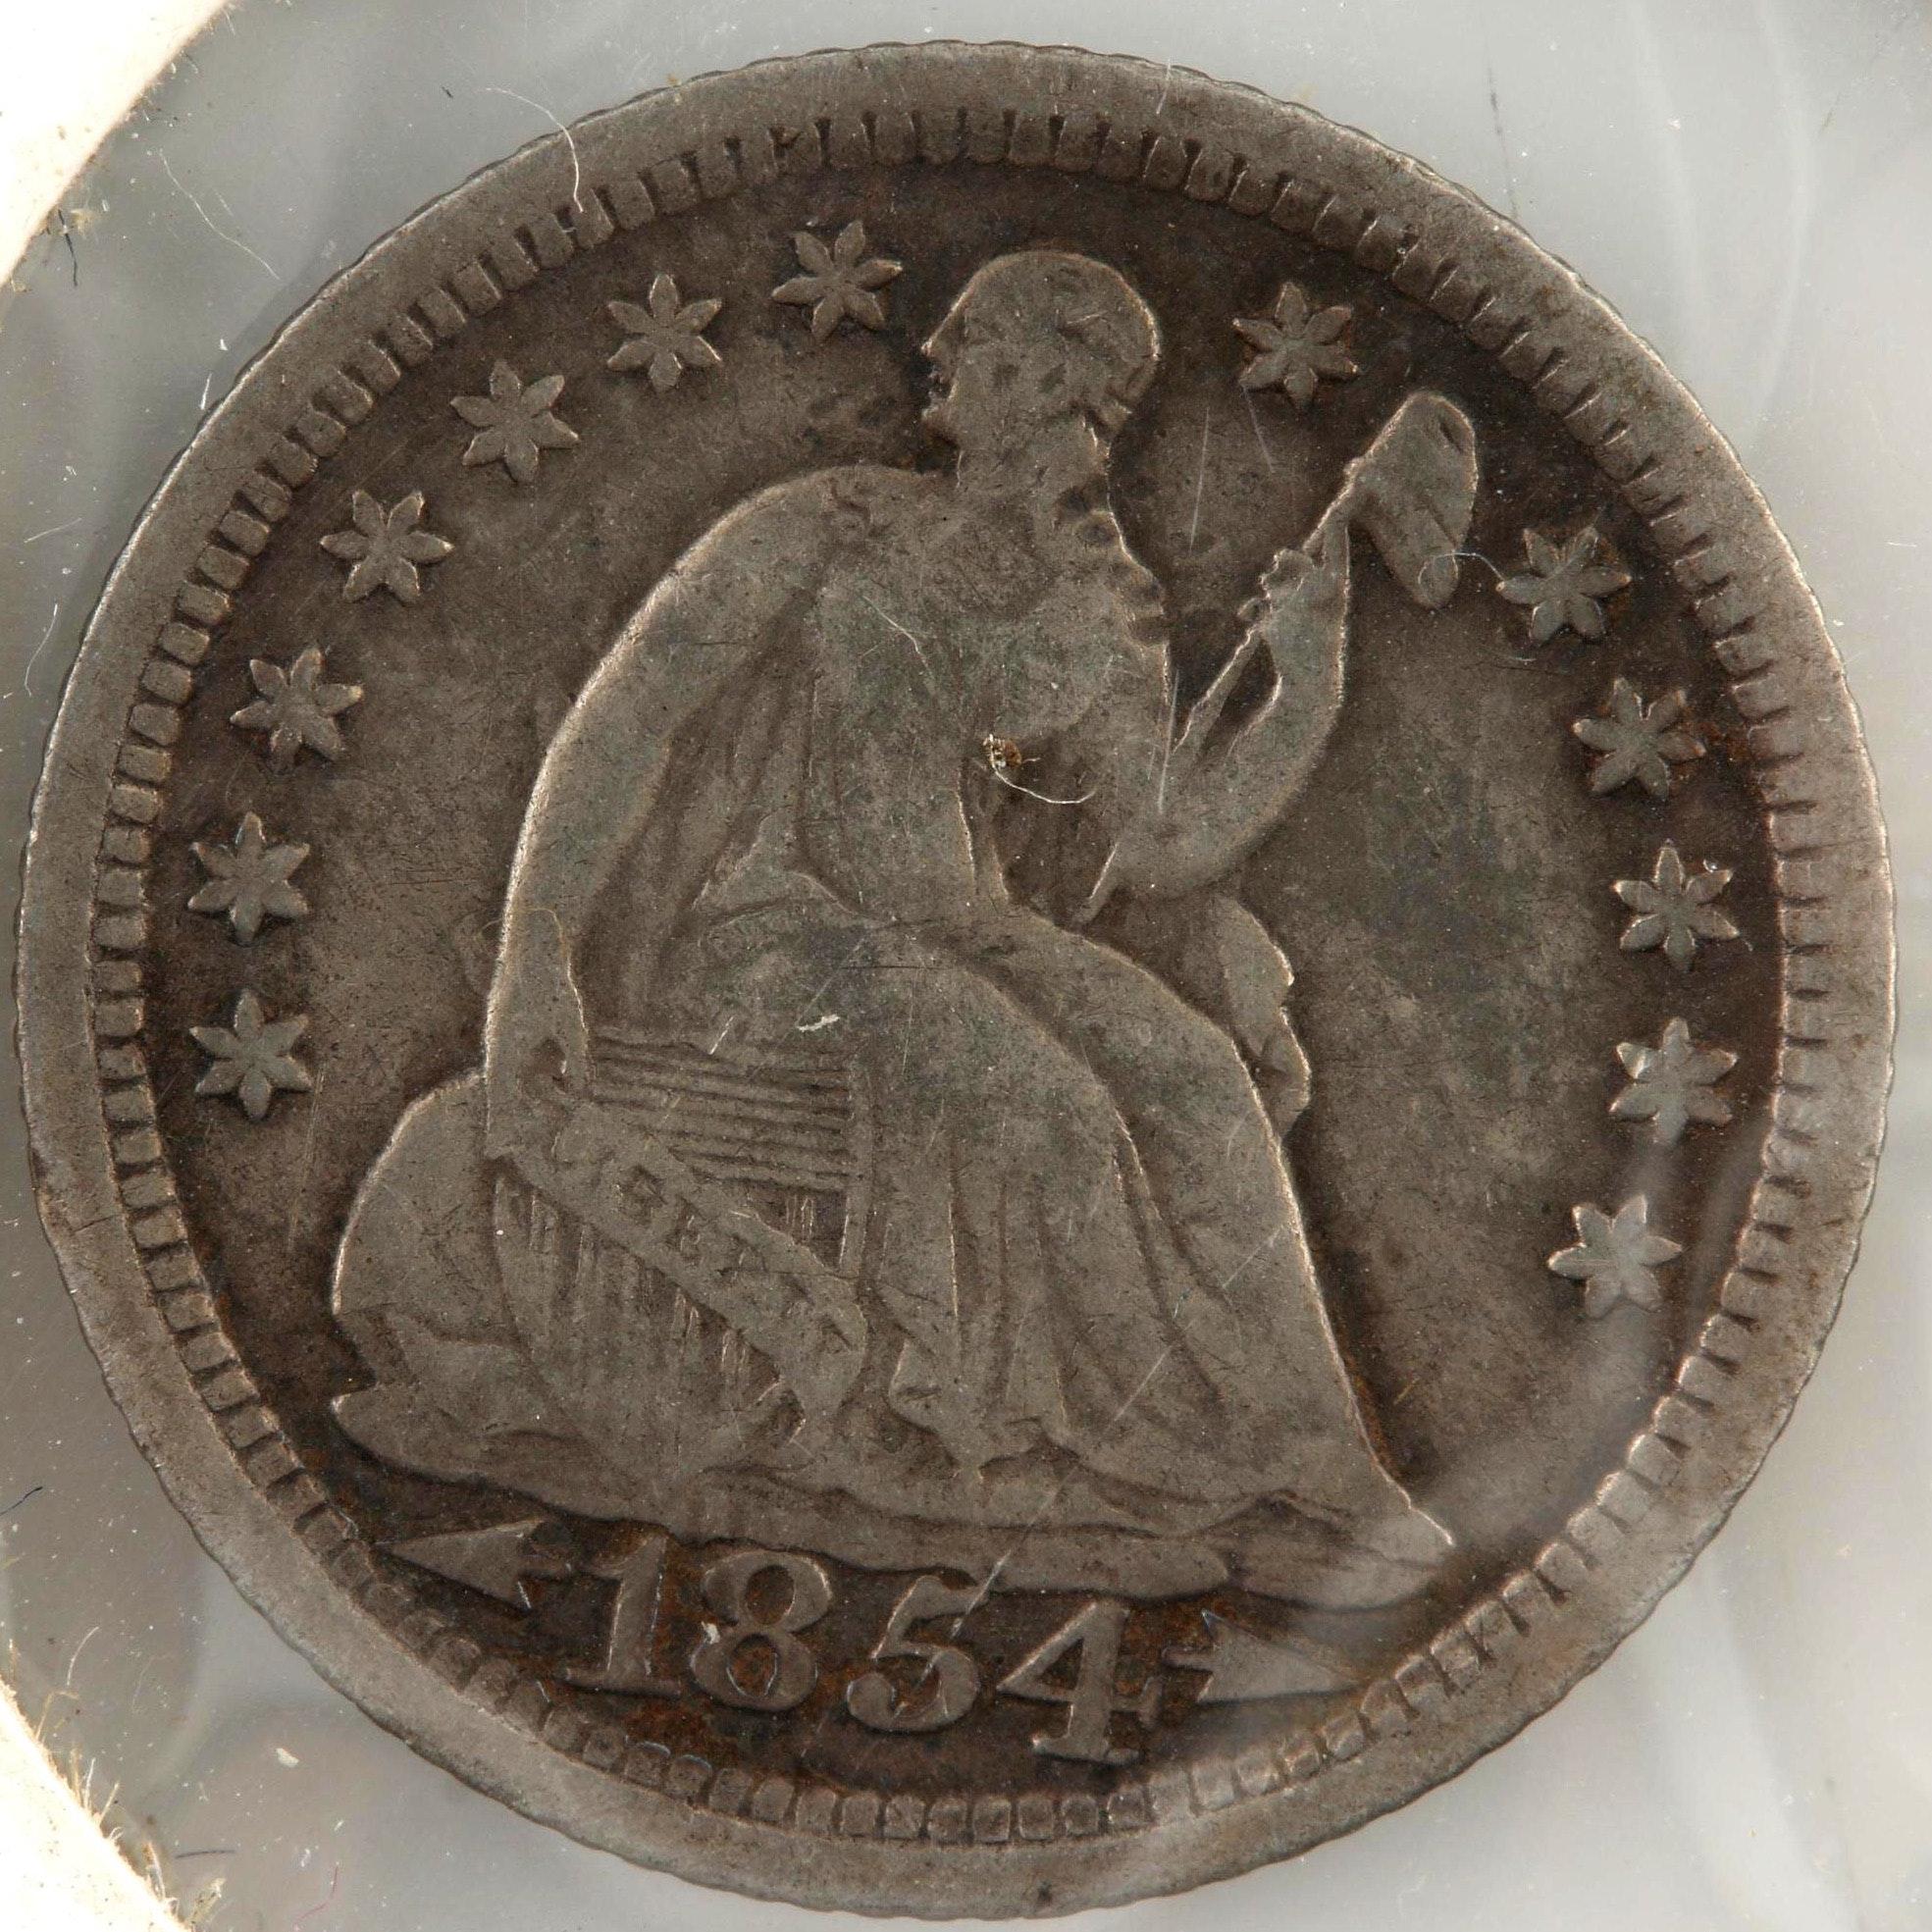 1854 Seated Liberty Silver Half Dime